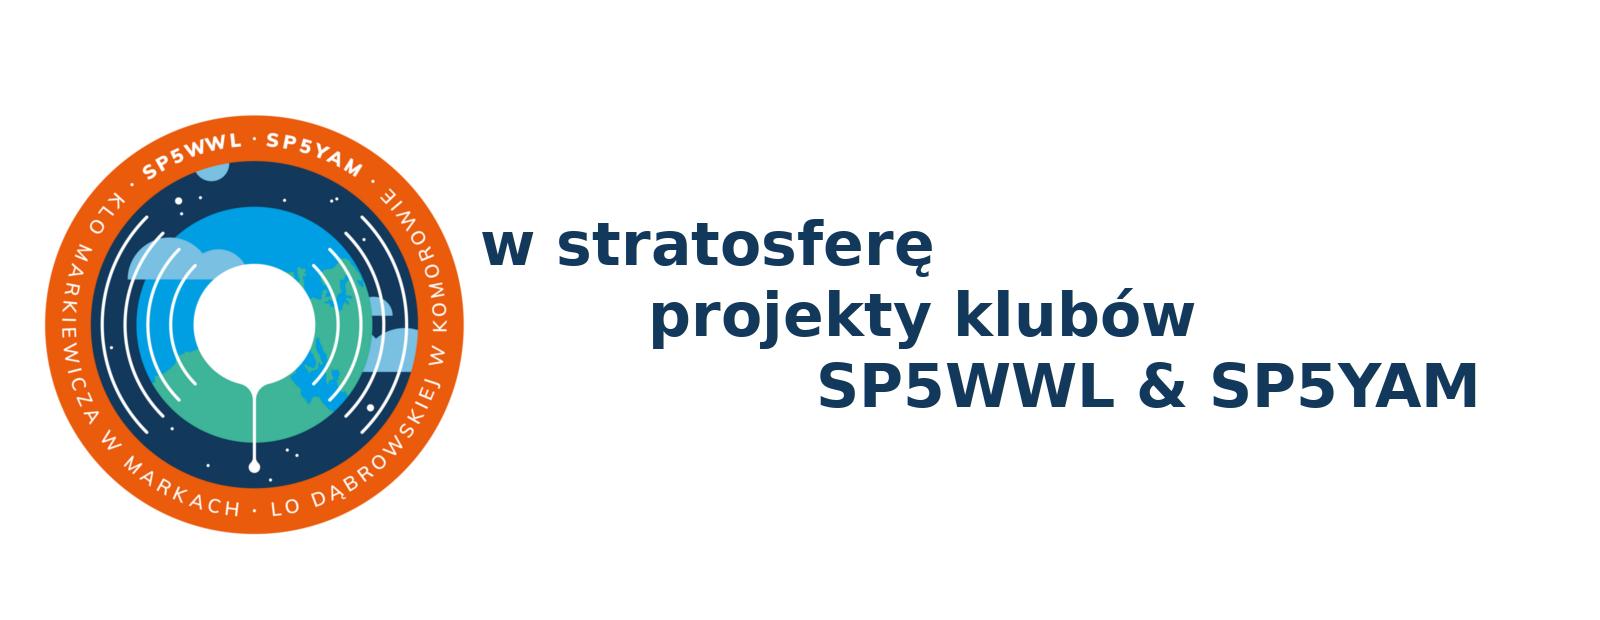 wstartosfere.pl